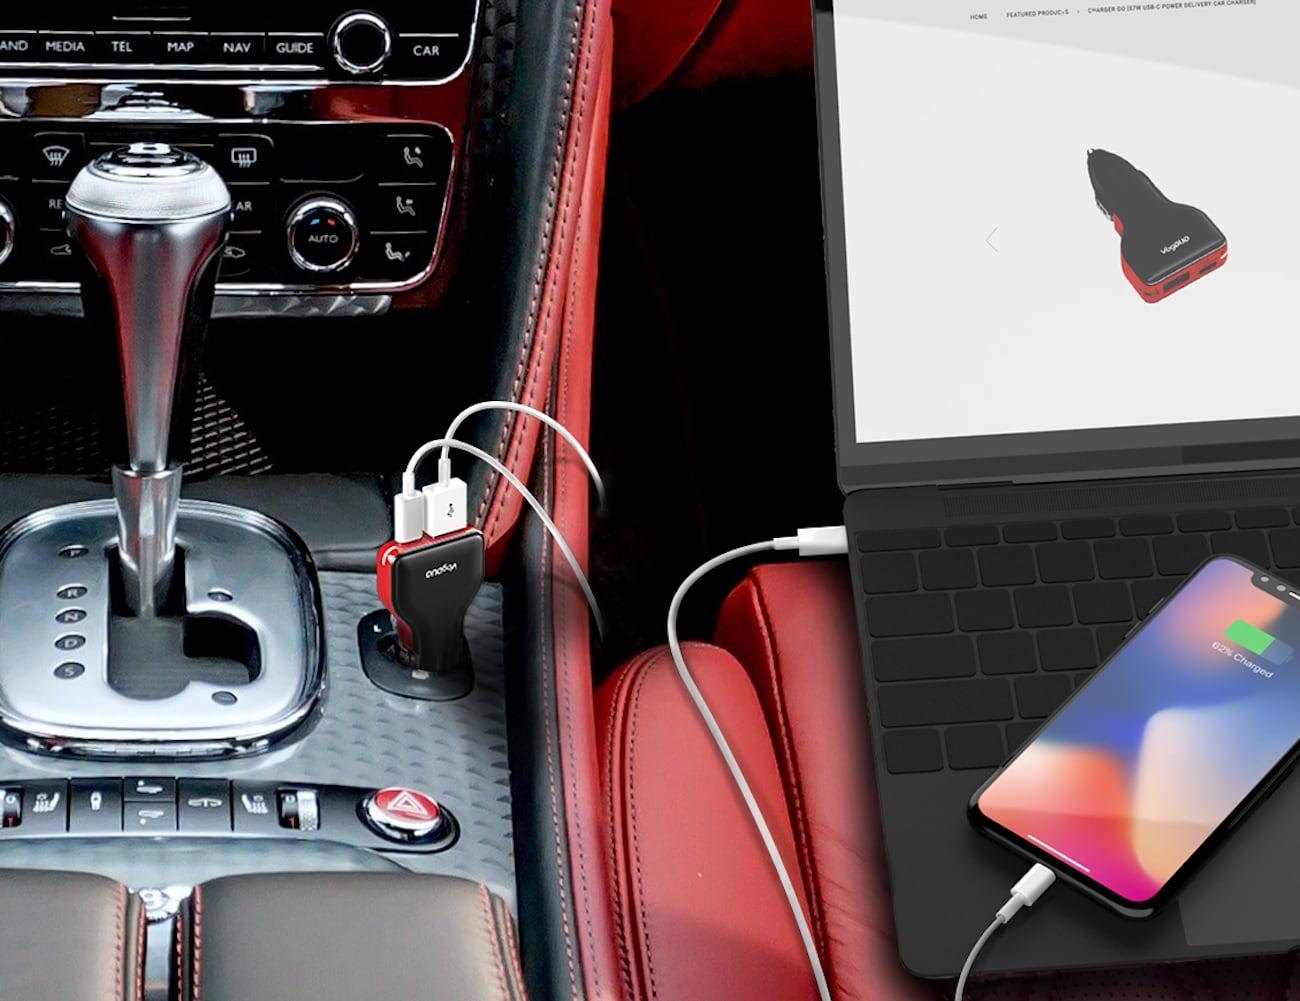 VogDUO USB-C Car Charger